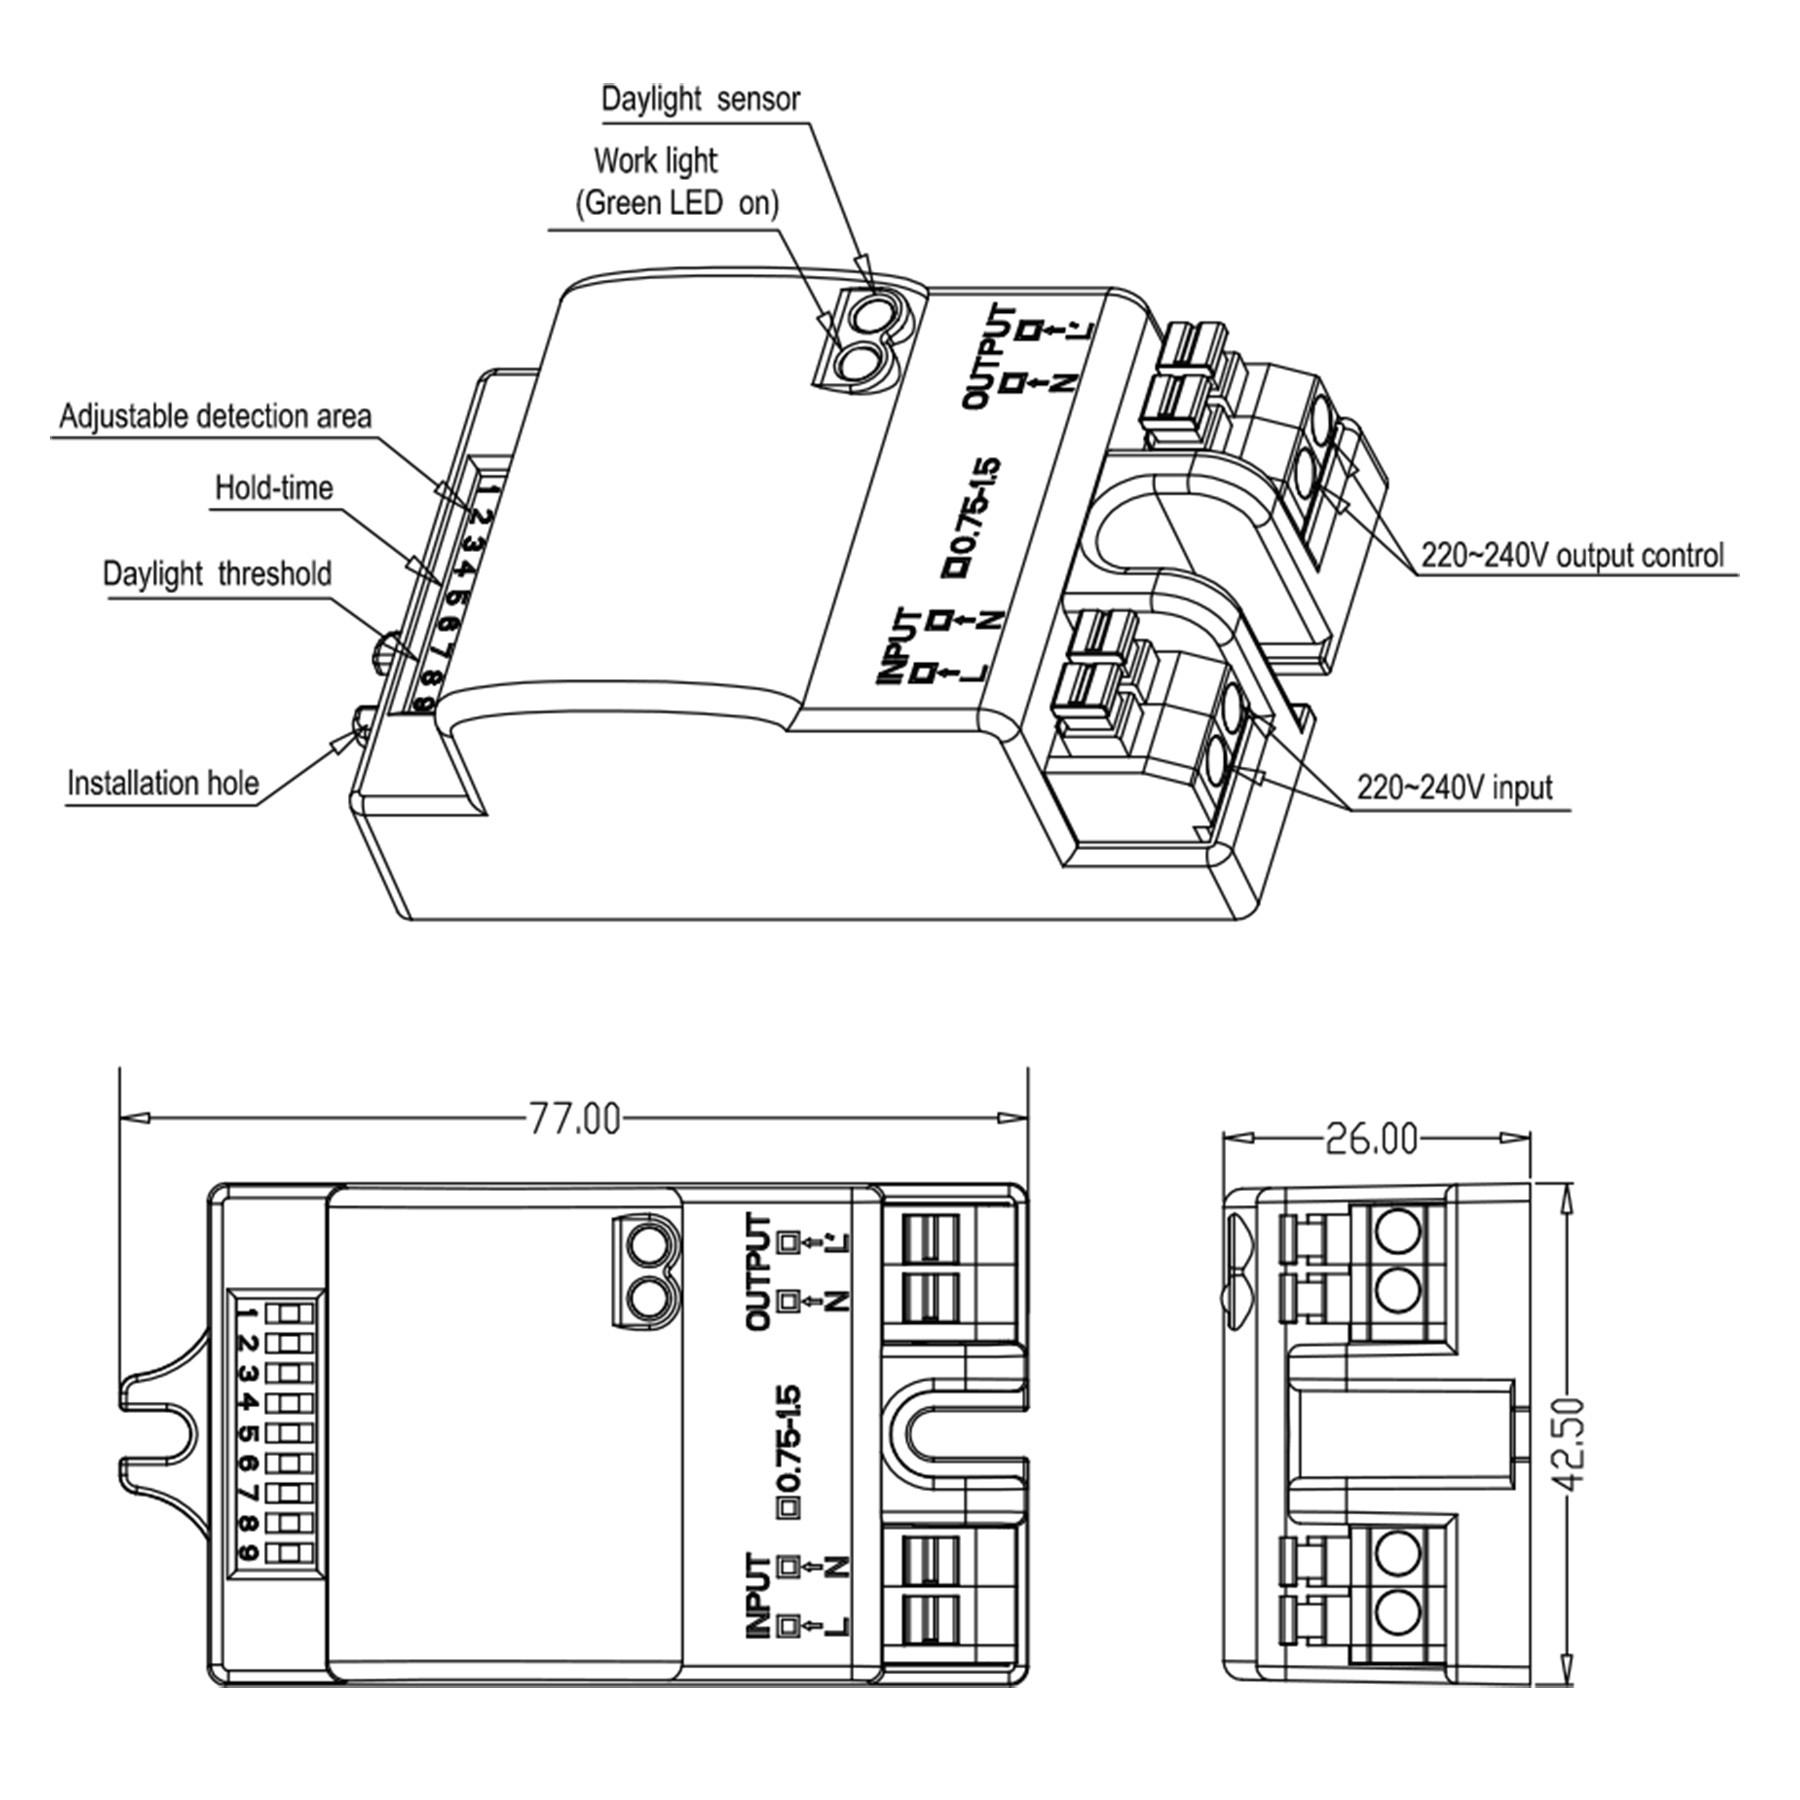 hight resolution of ceiling mount occupancy sensor wiring diagram sample wiring rh faceitsalon com lutron ceiling occupancy sensor wiring